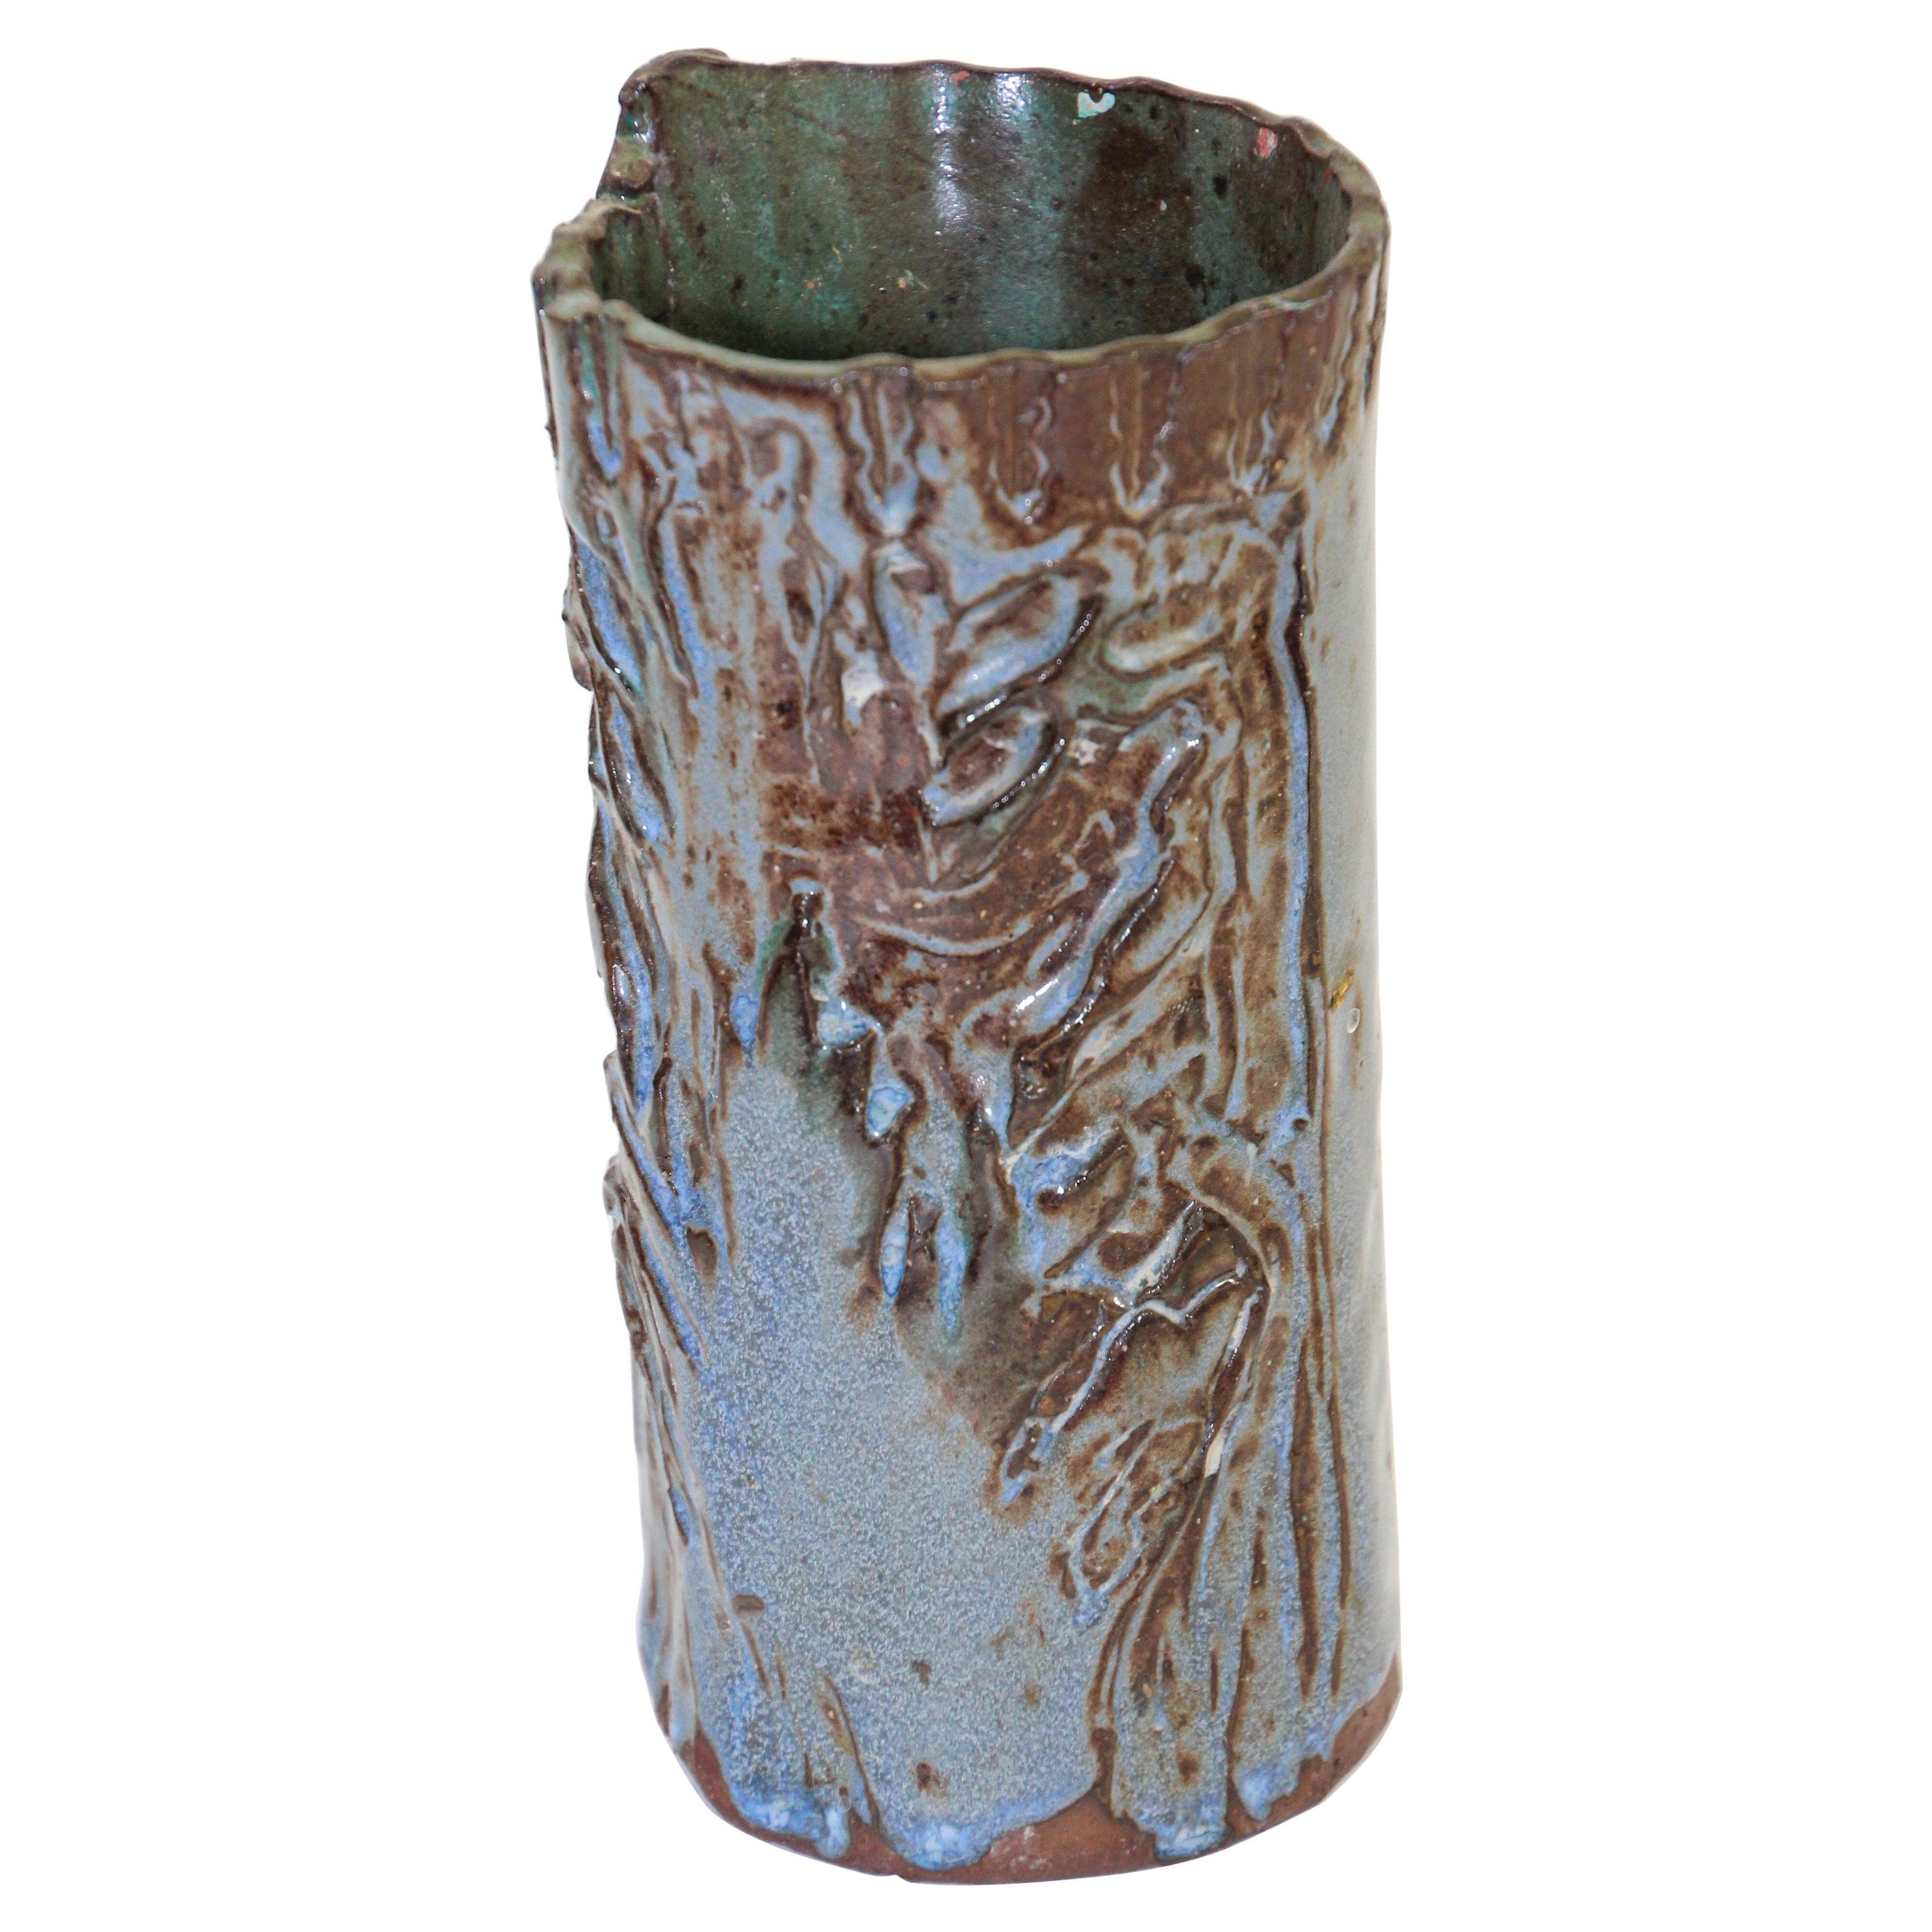 California Studio Organic Pottery Vessel Brush Pot Vase